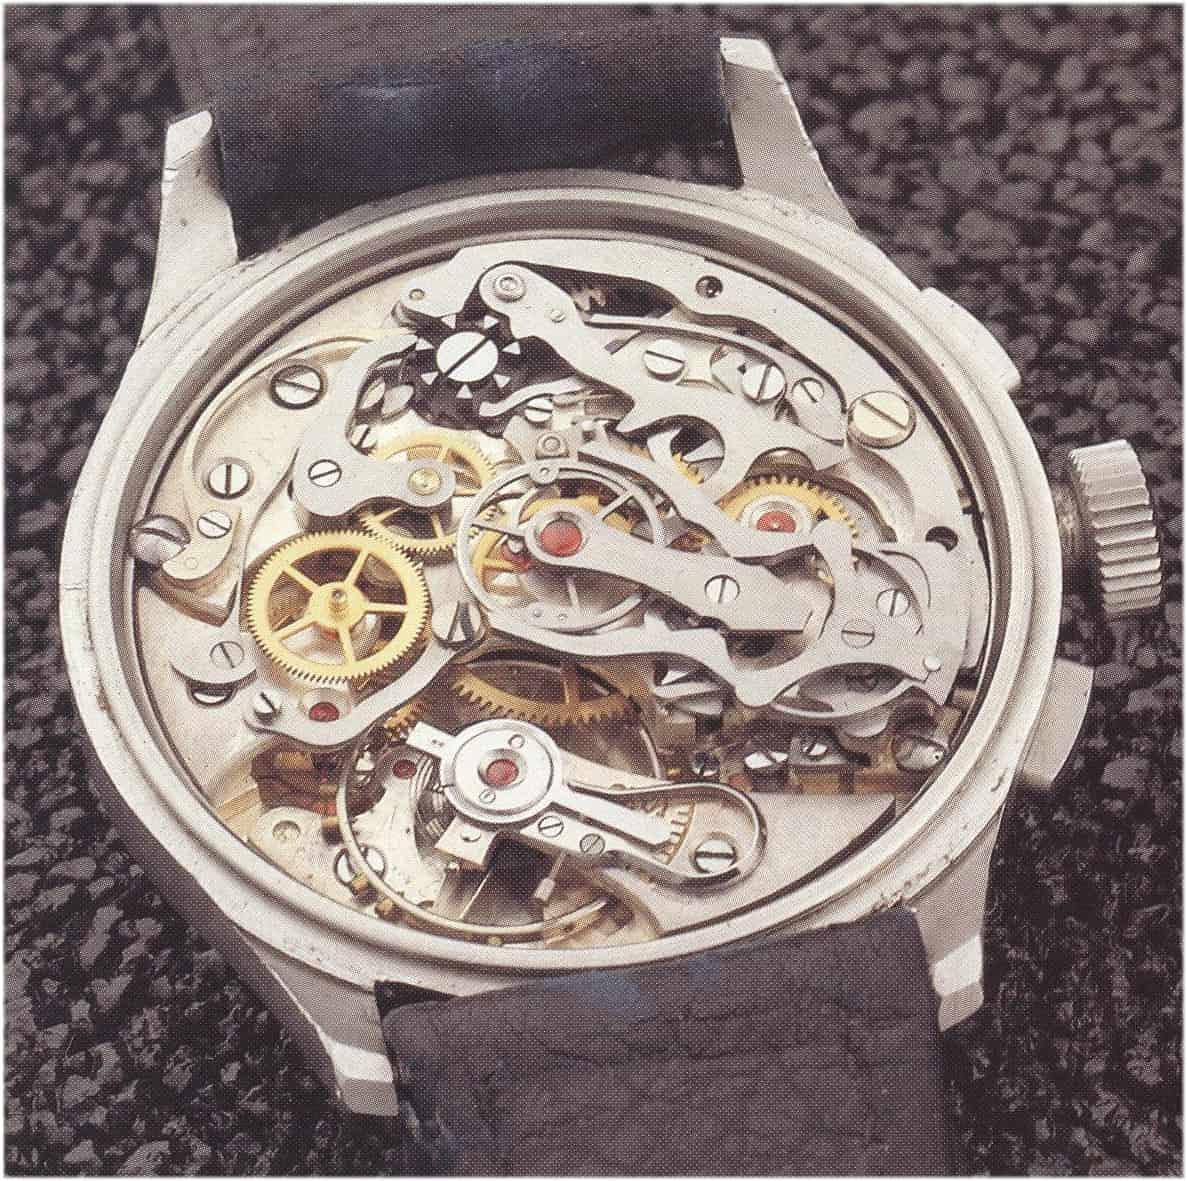 Breitling-Duograph-1950-Kaliber-Venus-179-C-Uhrenkosmos.jpg